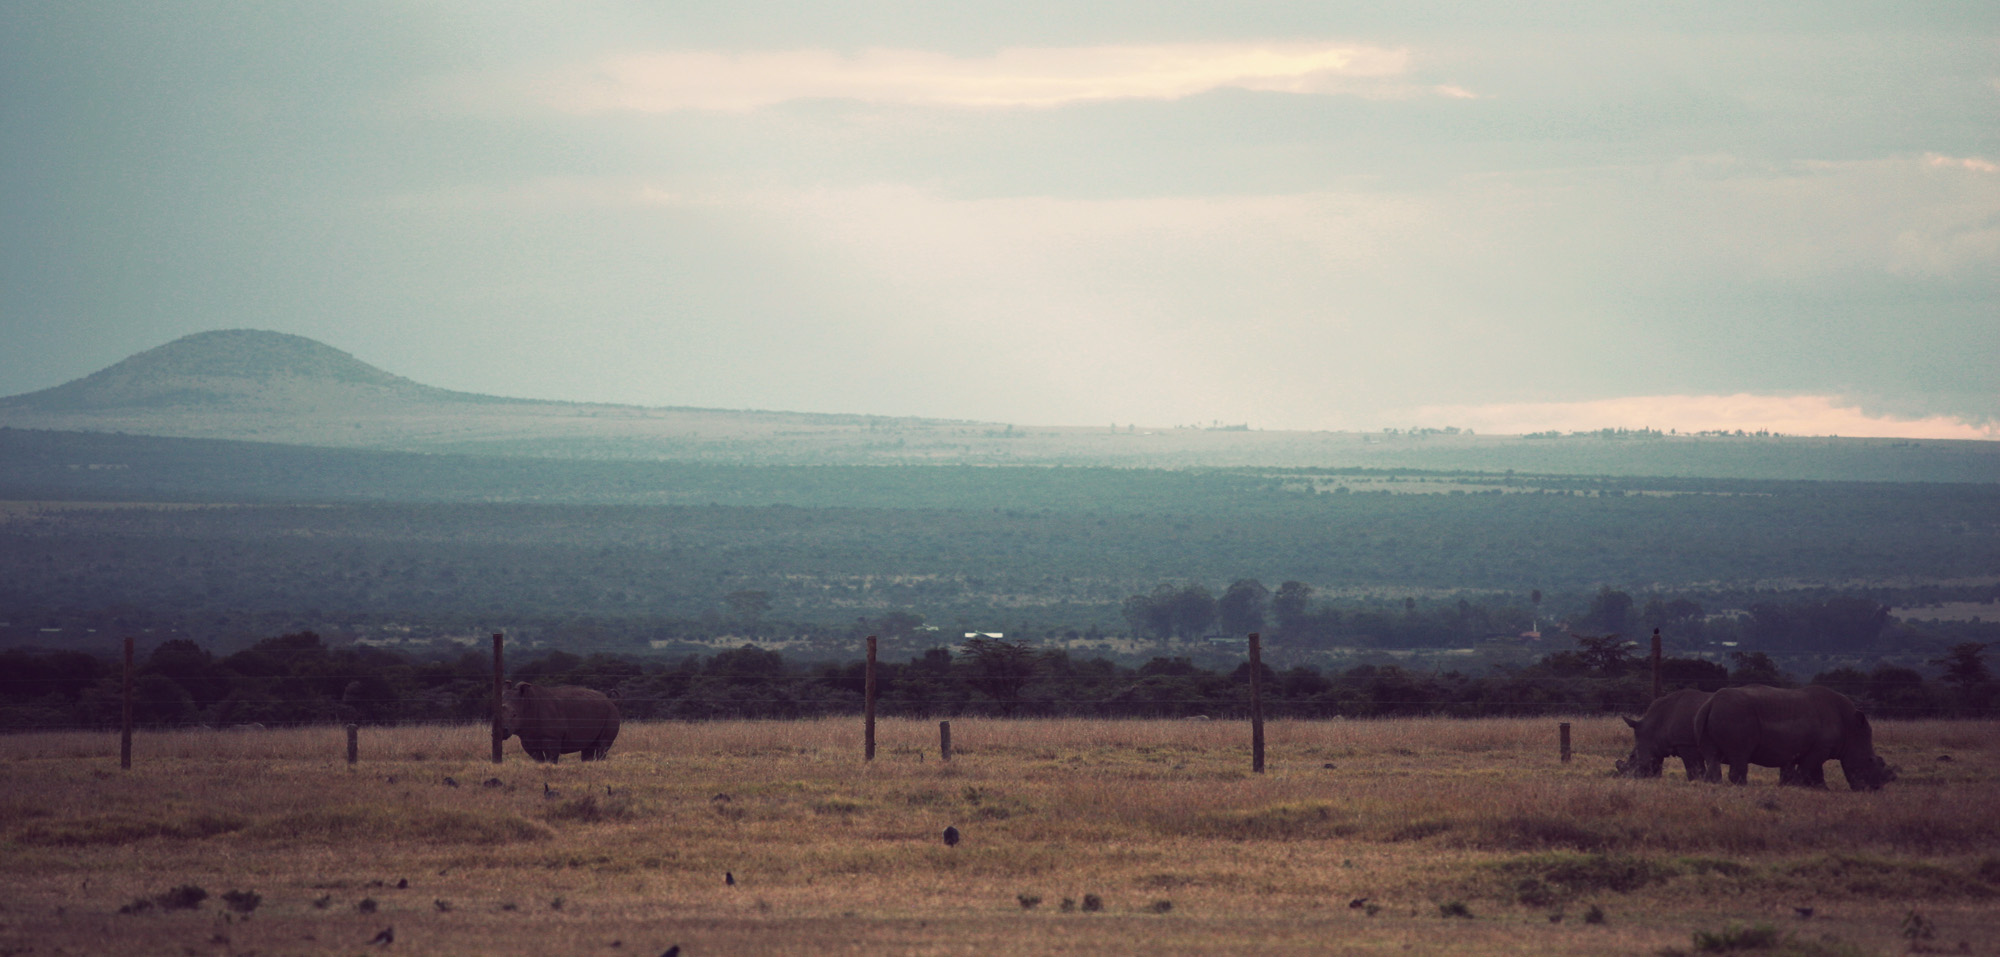 Northern White Rhinos